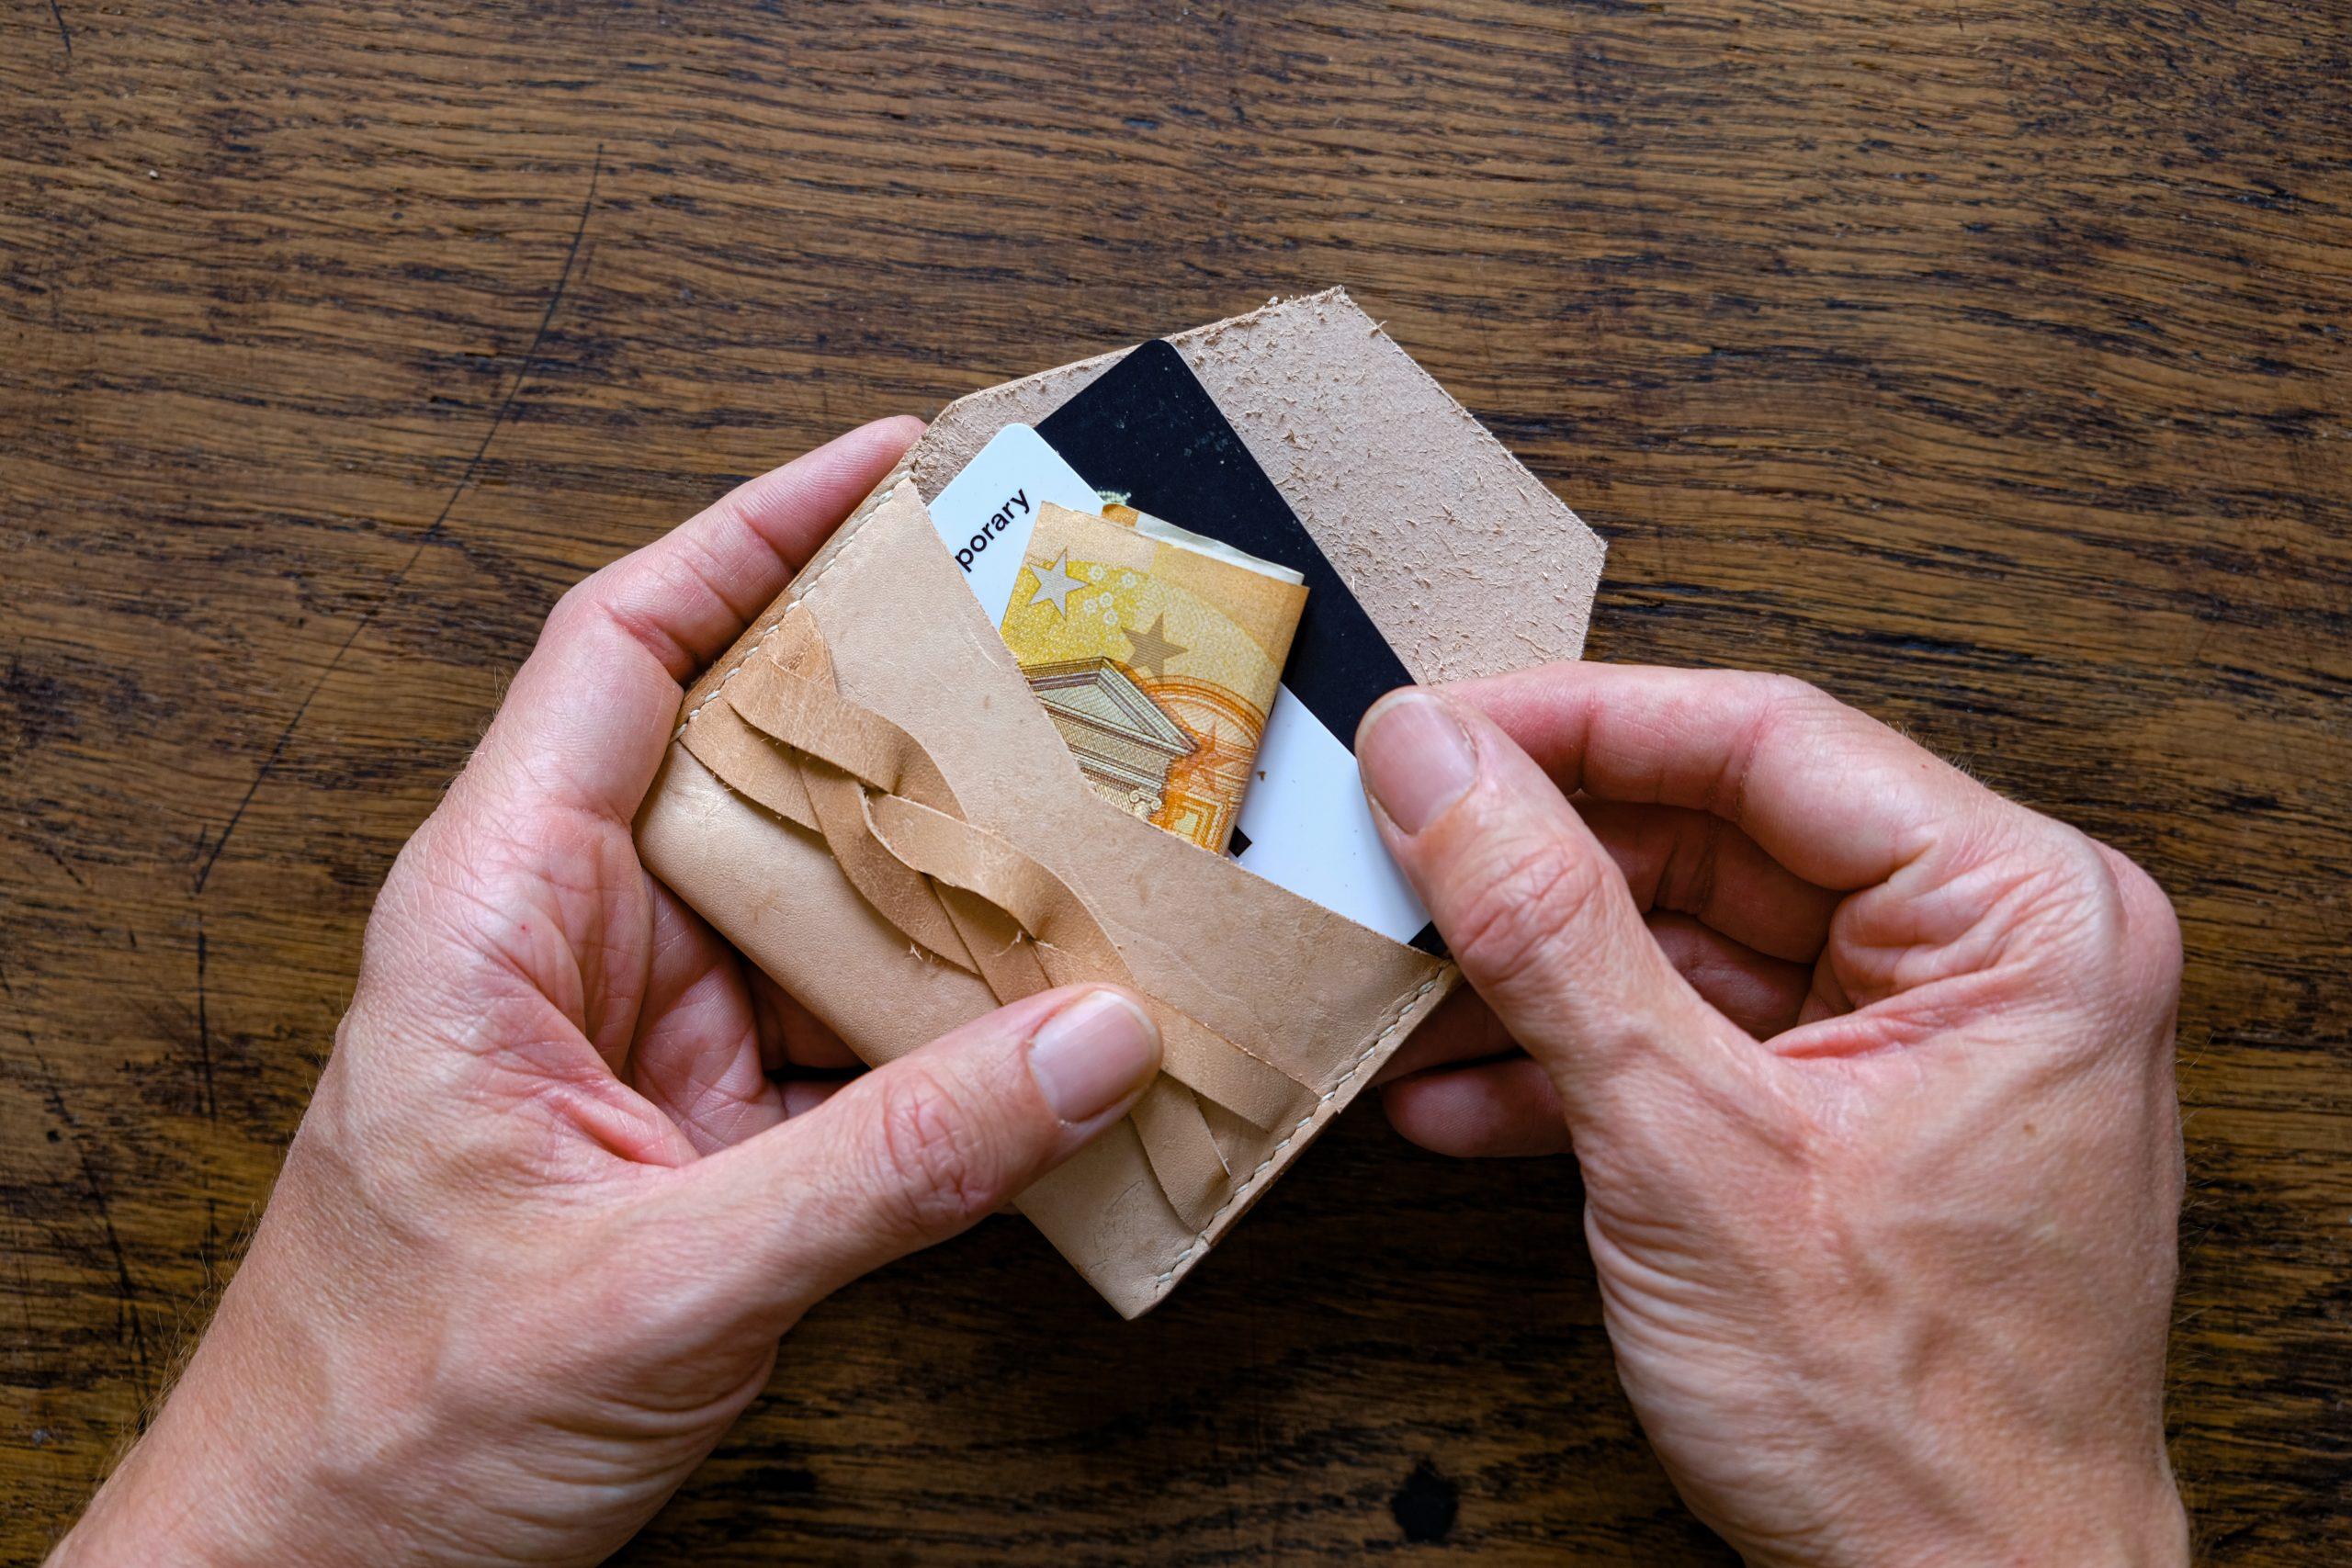 lerif designs leather magic braid cardholder hands demo on wood background